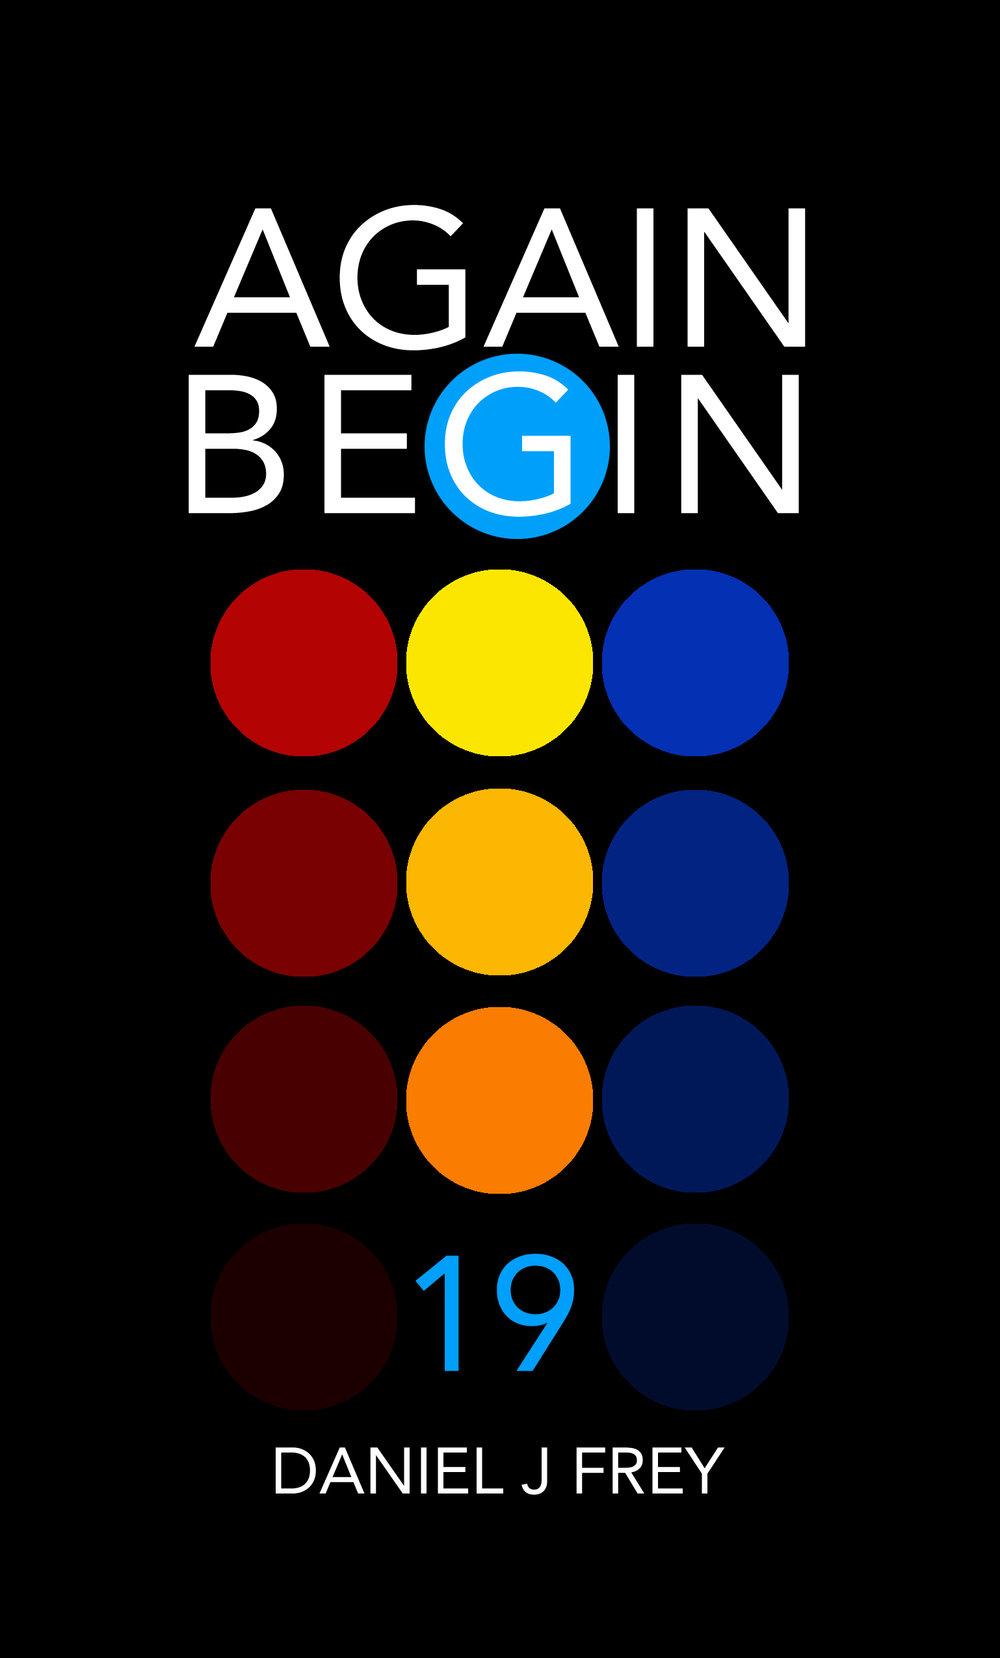 Again Begin 19 - Home